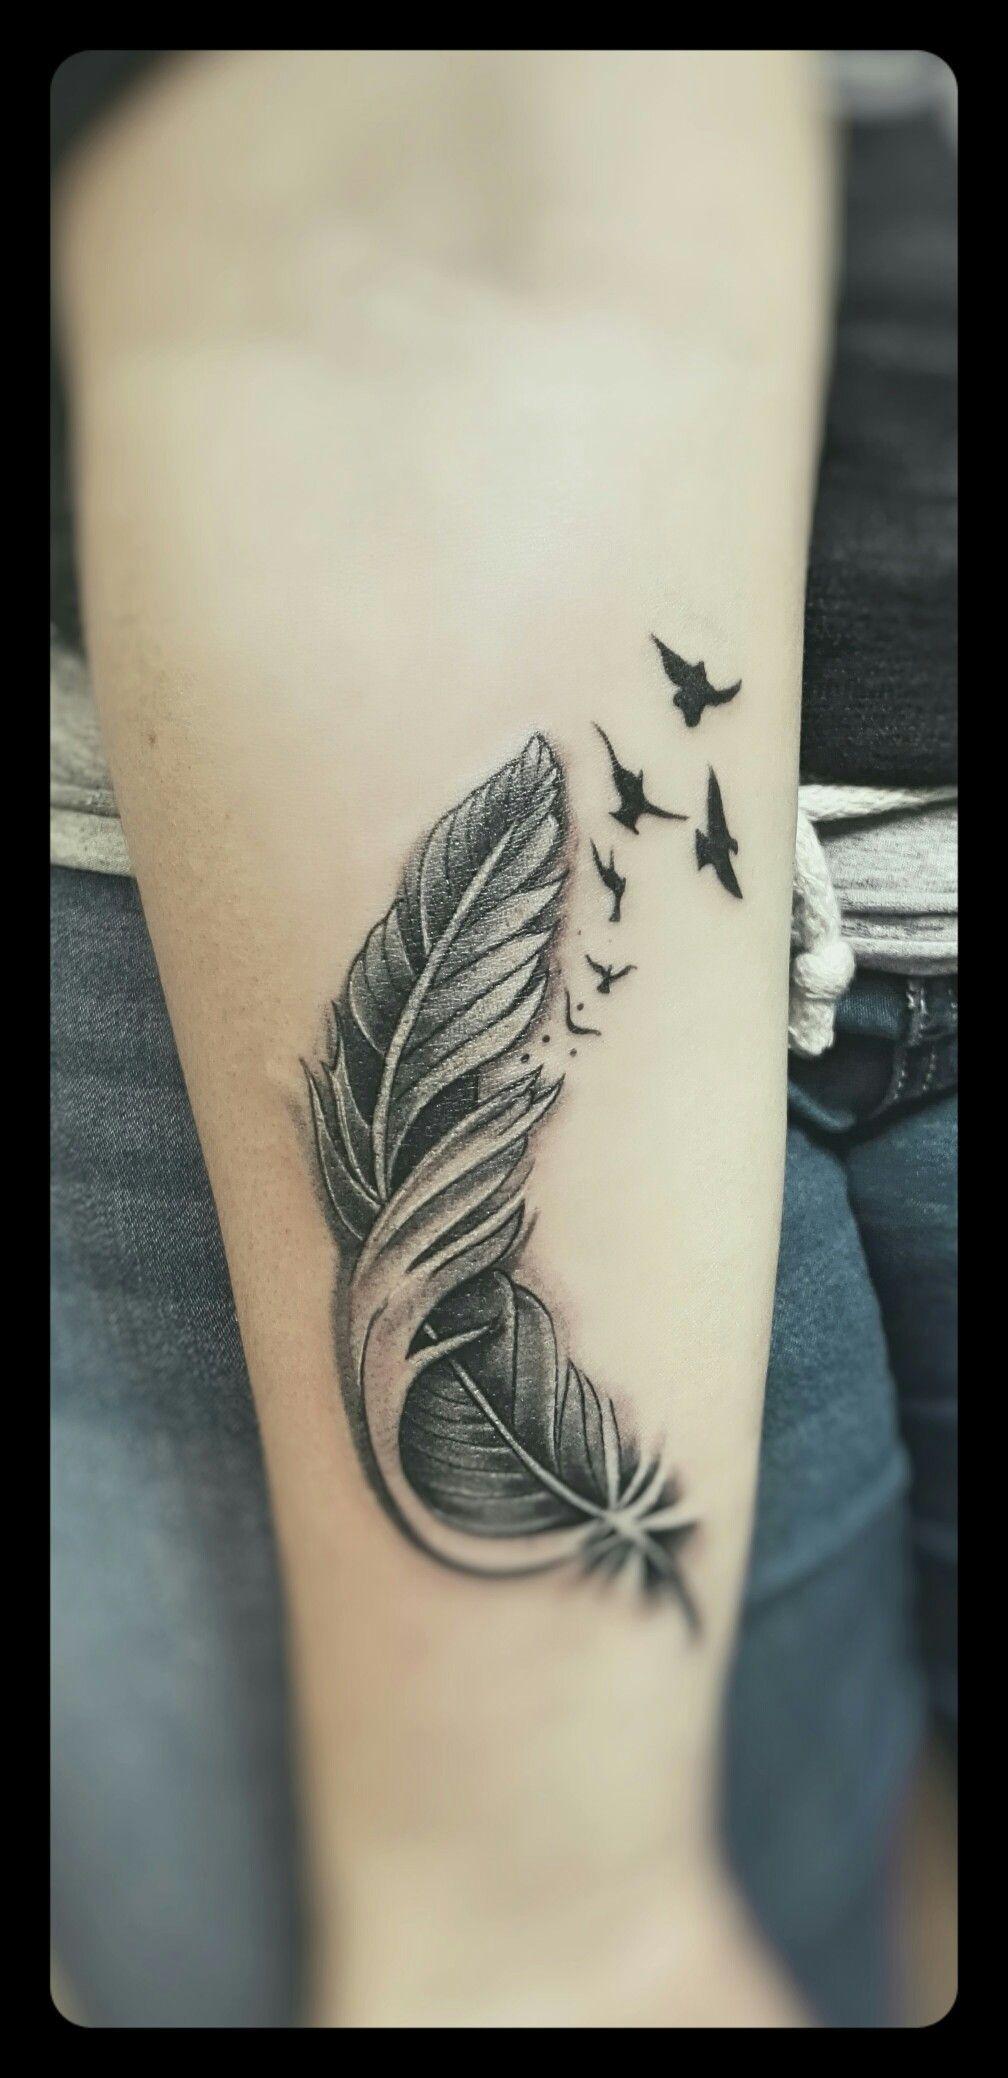 Pin De Lorena Grisales En Tatuajes Tatuajes De Plumas Tatuajes